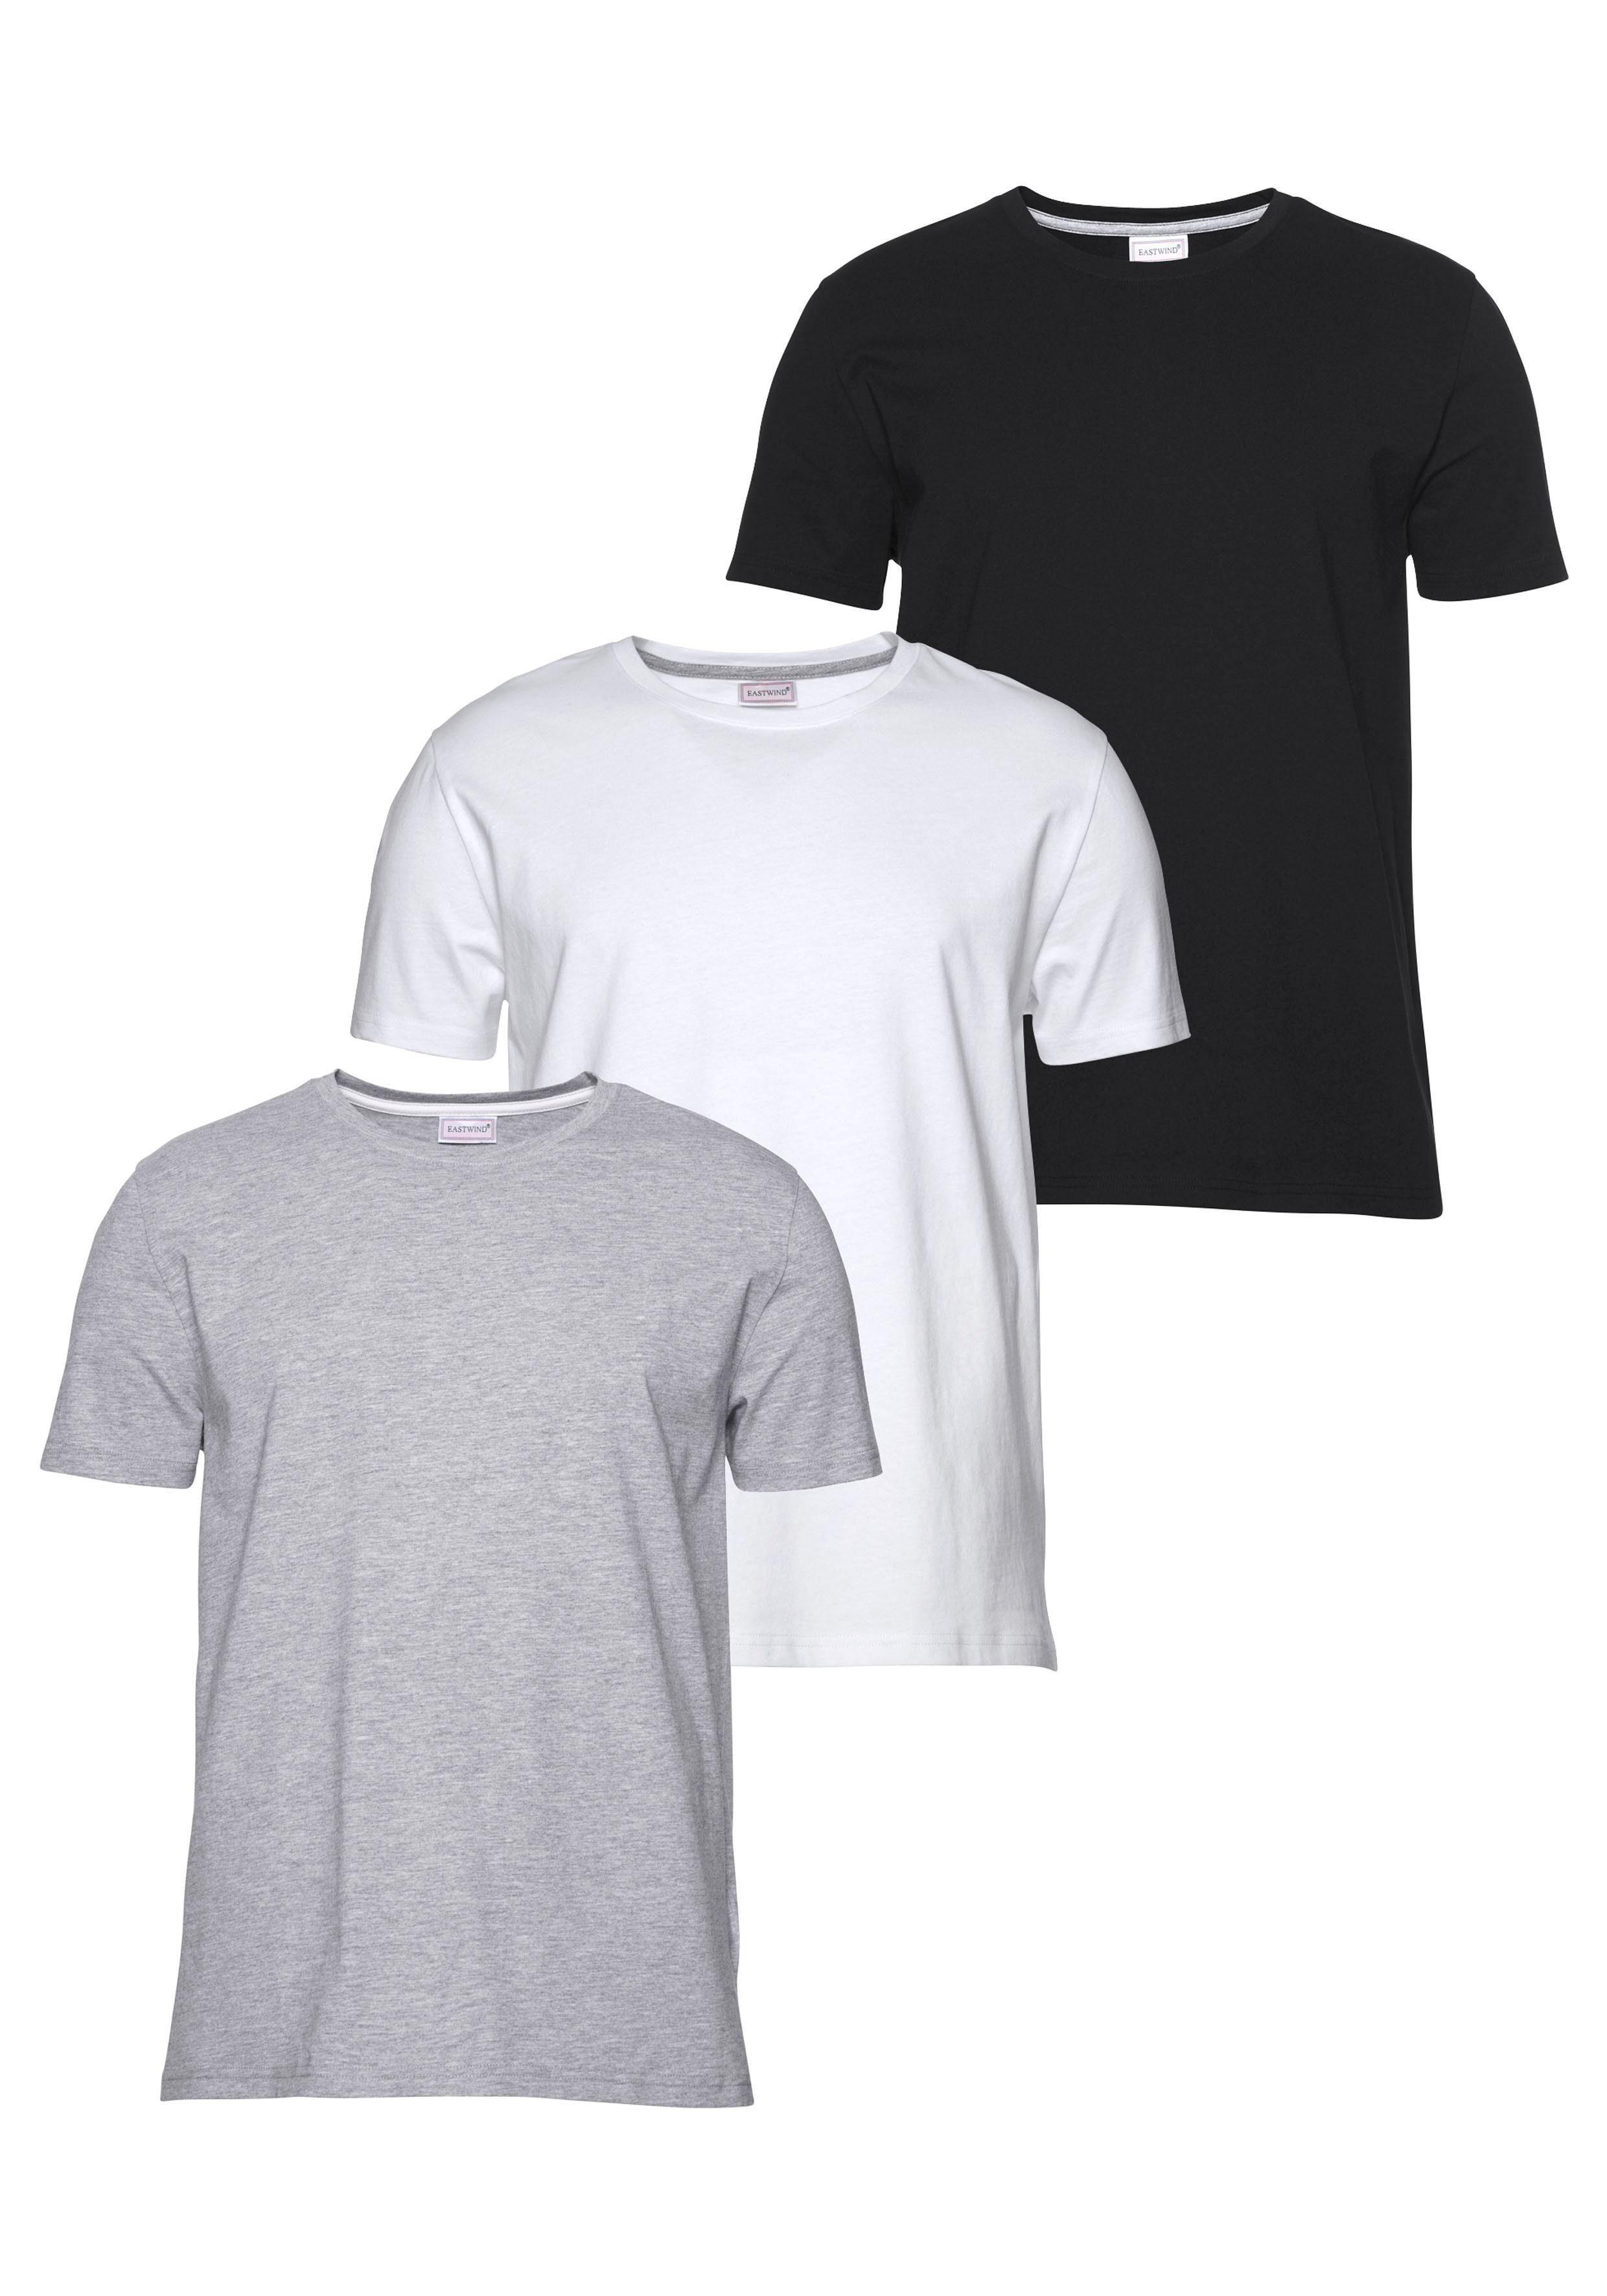 Eastwind T Shirt (Spar Set, 3er Pack), 3er Packung T Shirts von Eastwind online kaufen   OTTO